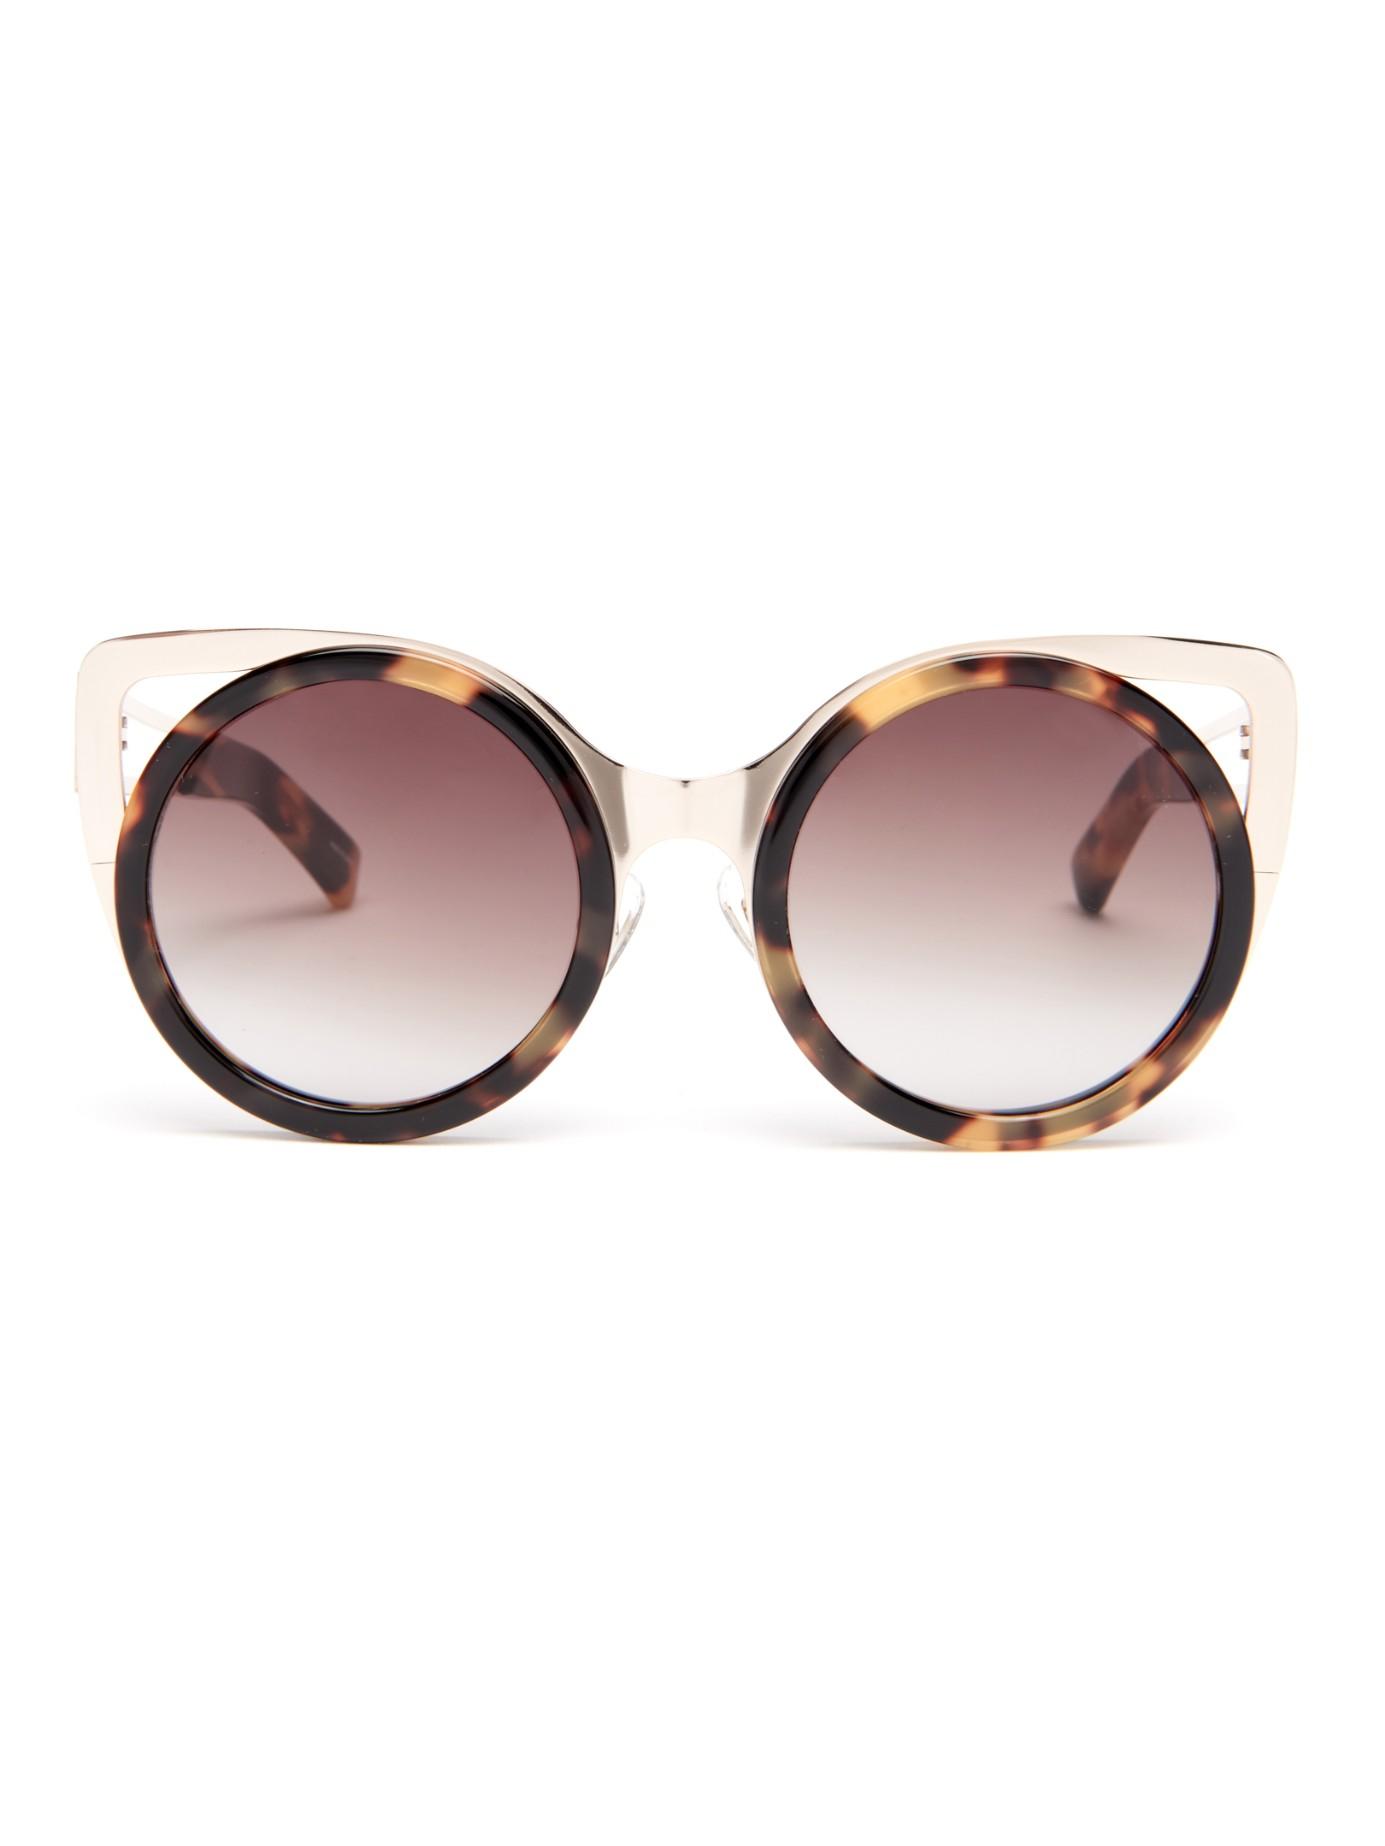 Erdem X Linda Farrow Cat-eye Sunglasses In Brown